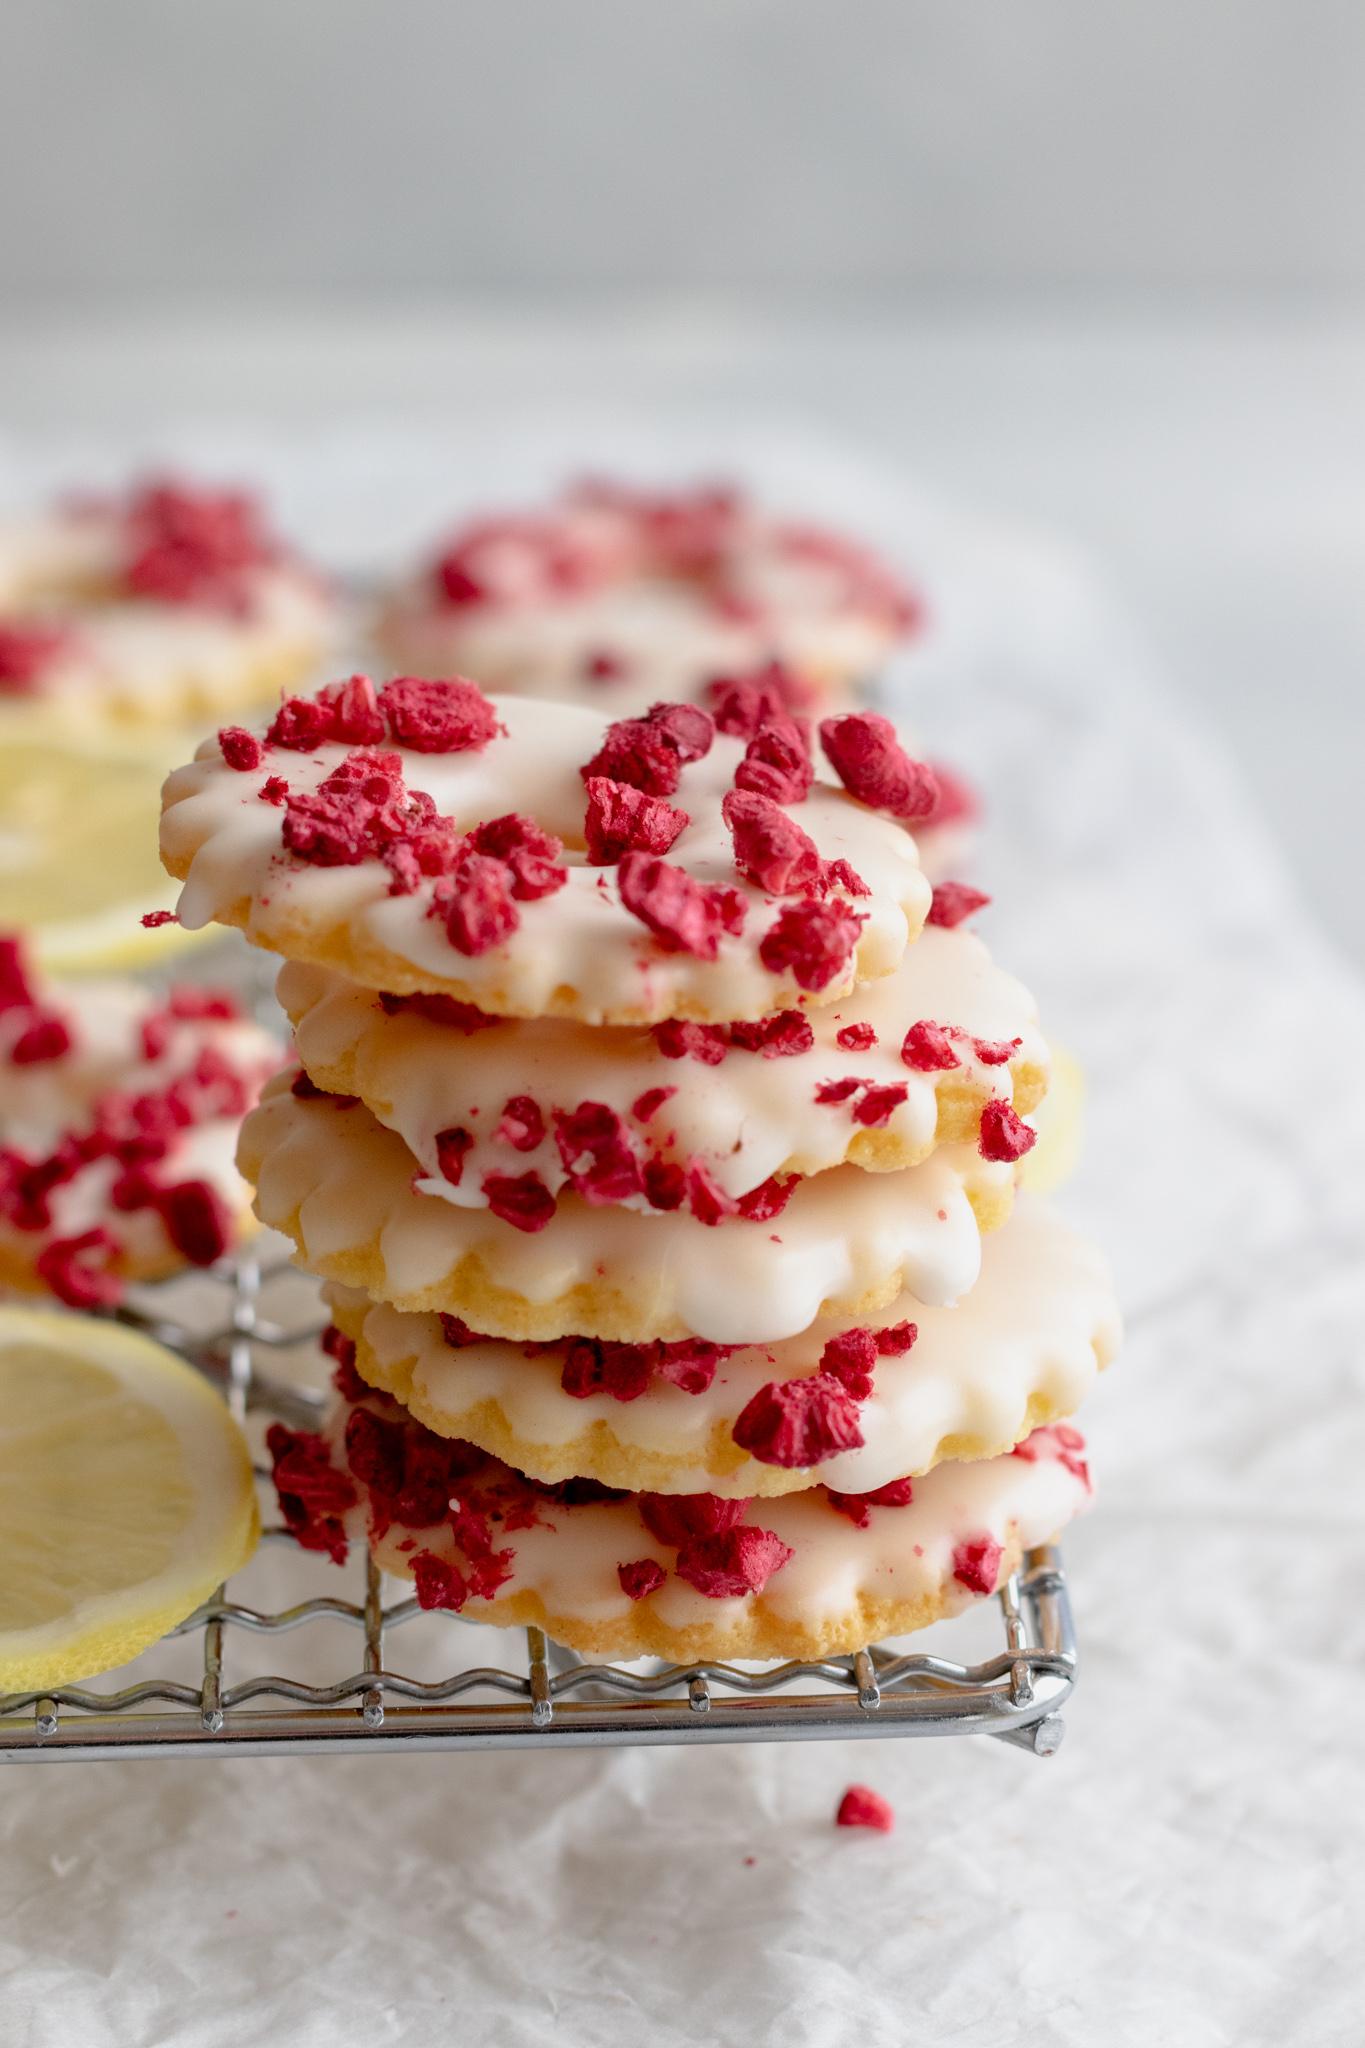 Image of Raspberry Zitronen Ringe Cookies stacked